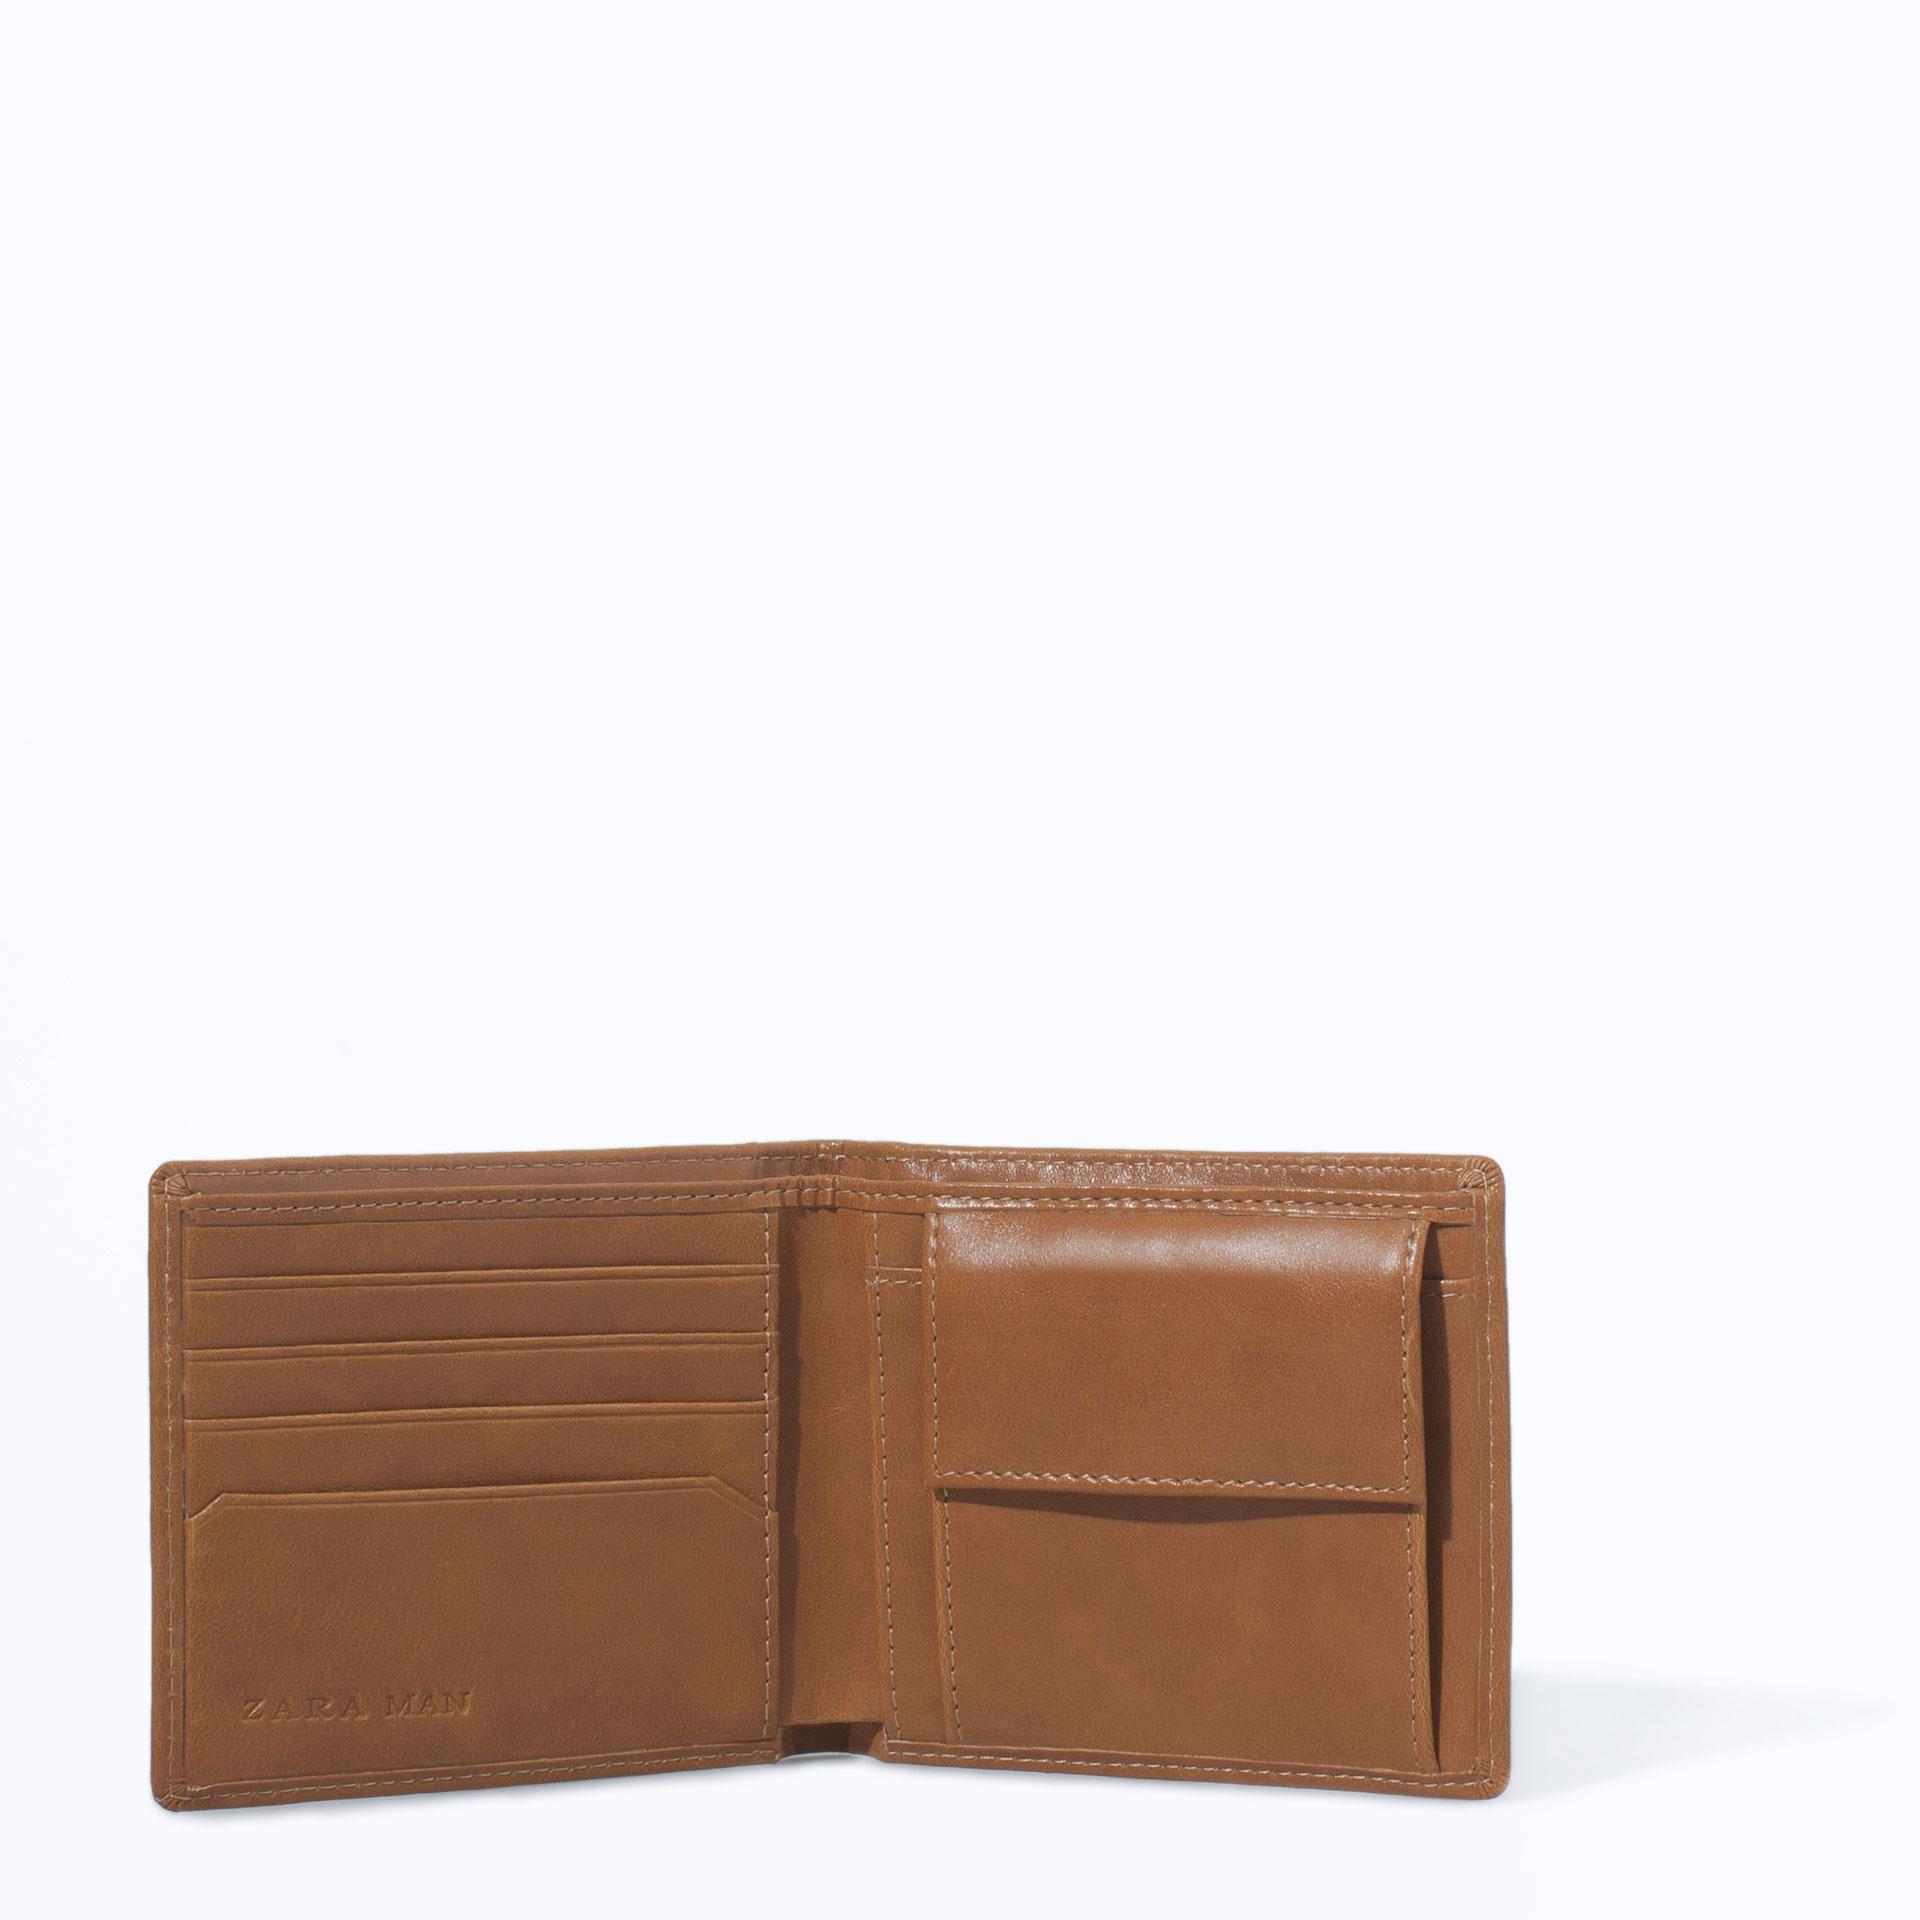 Zara Wallet In Brown For Men Lyst